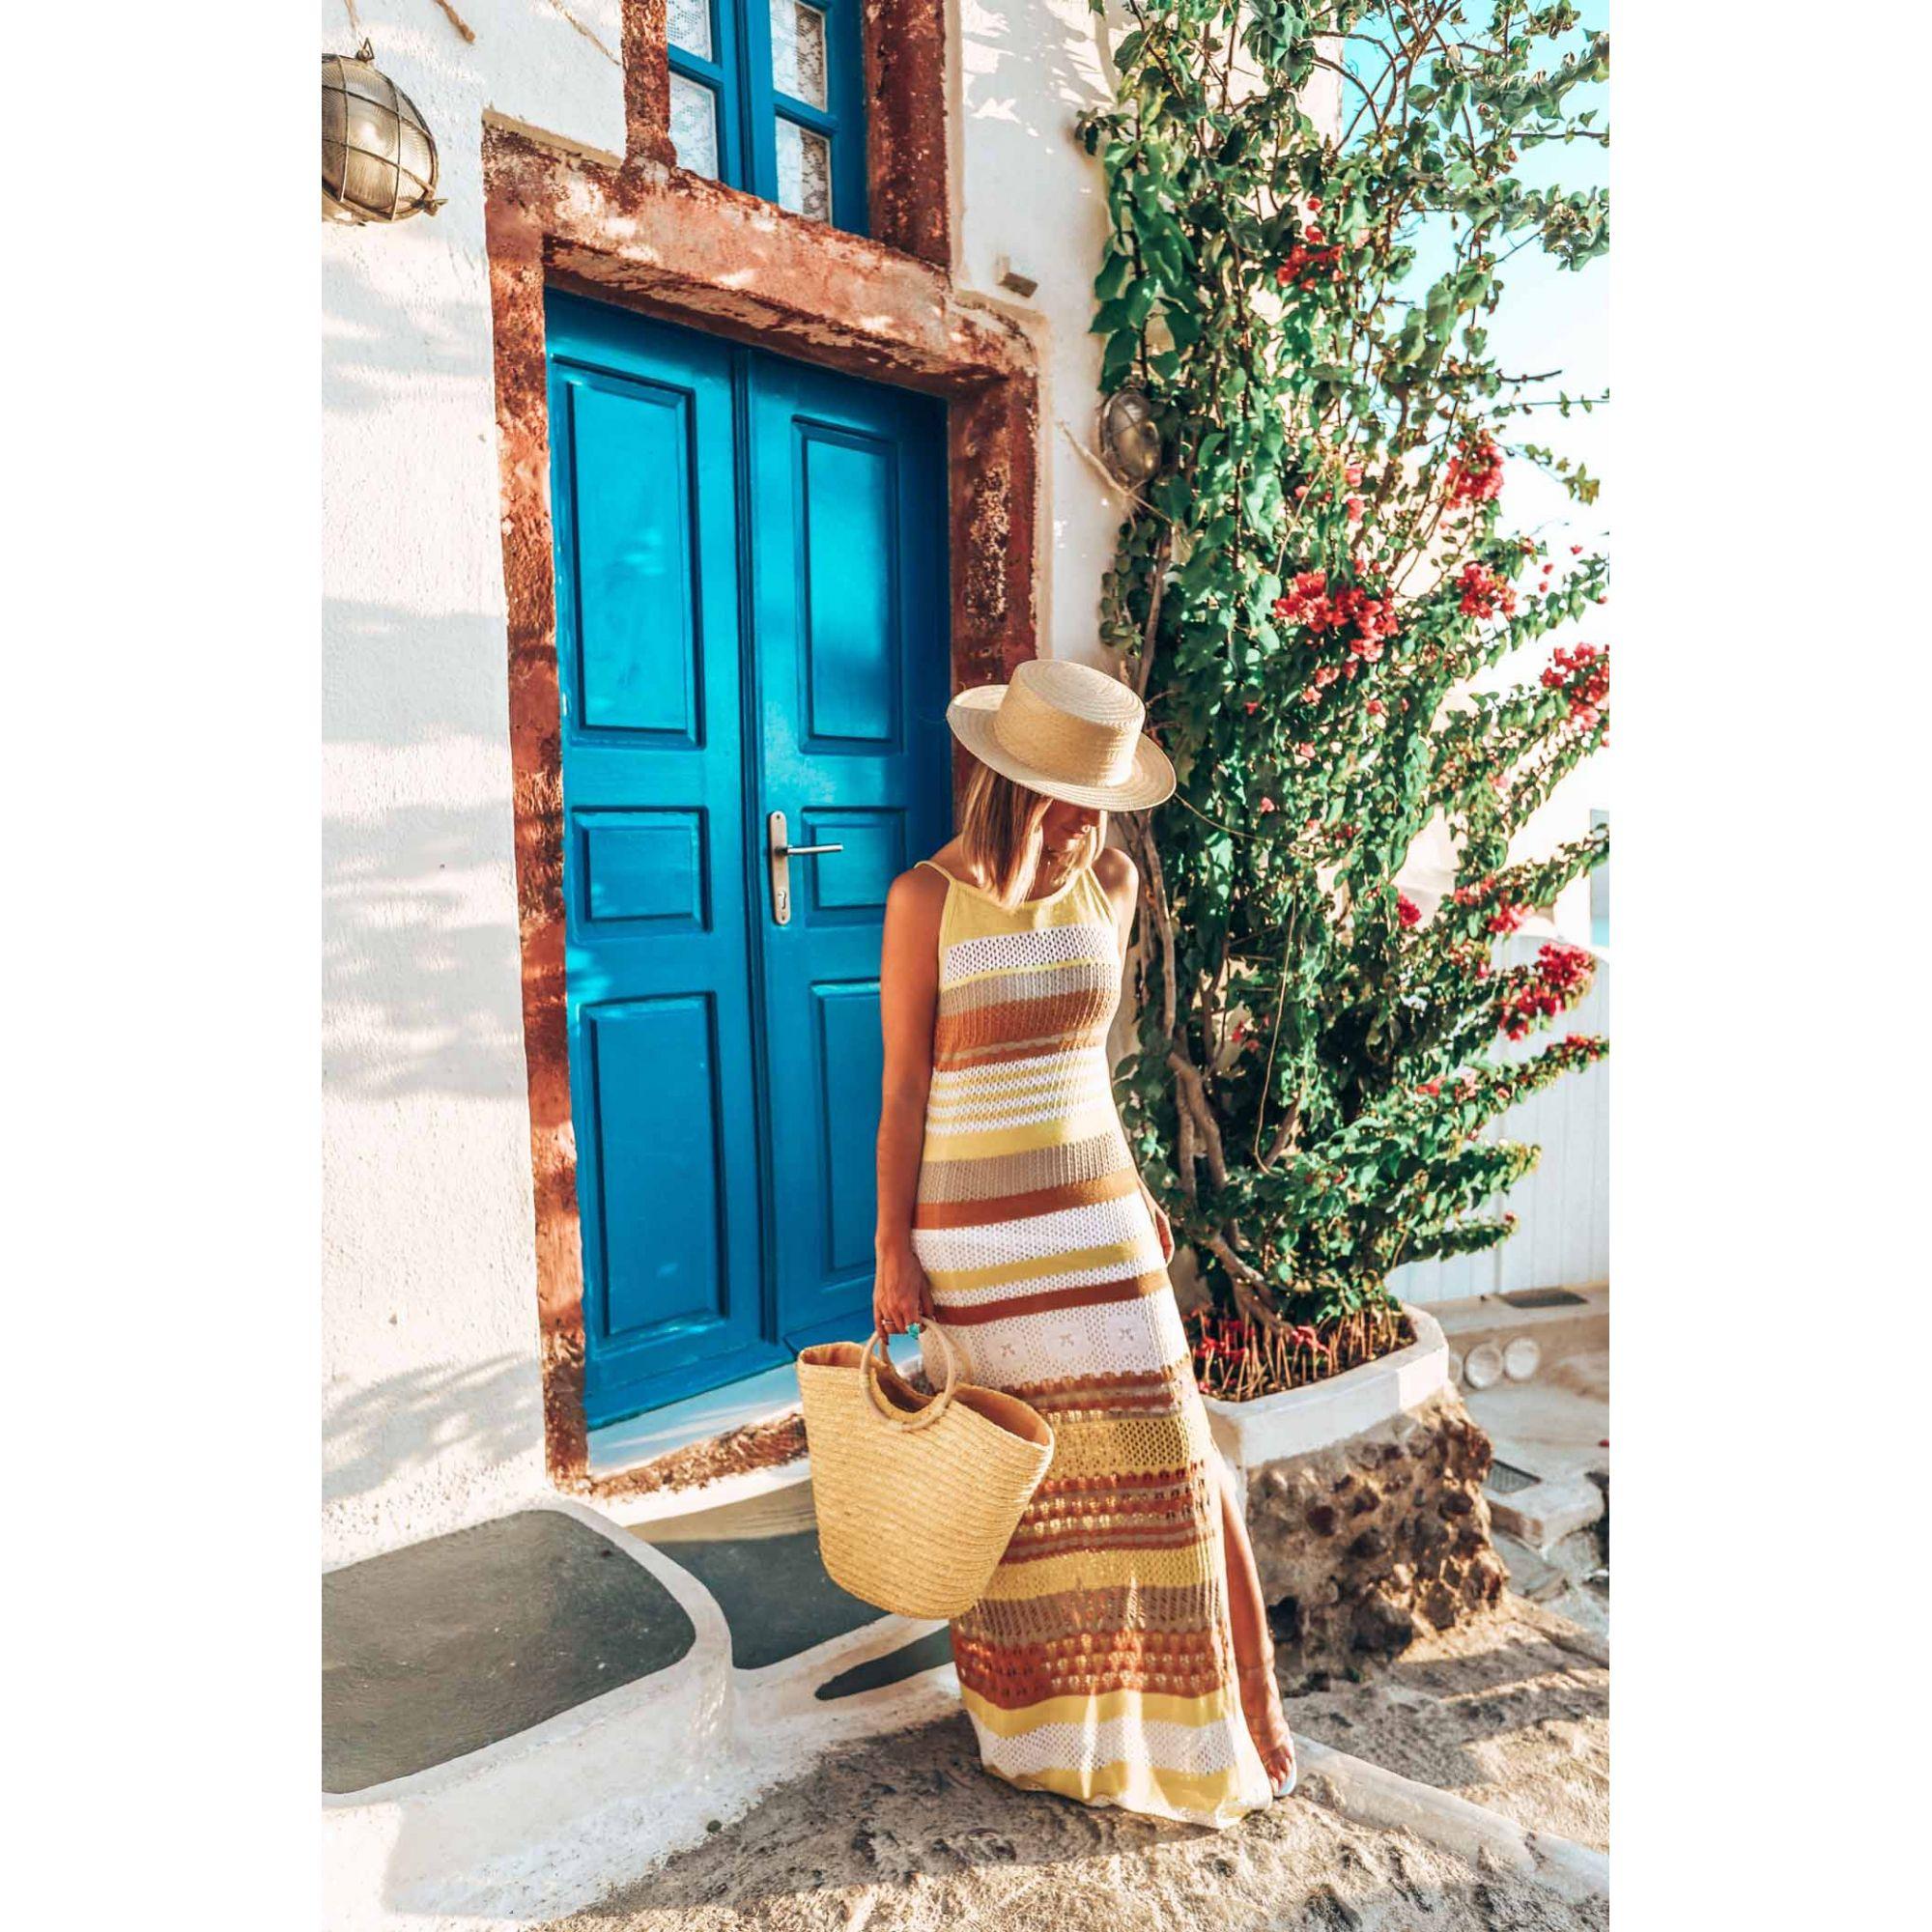 Vestido Longo Vera Tricot Alças Listrado Feminino Amarelo